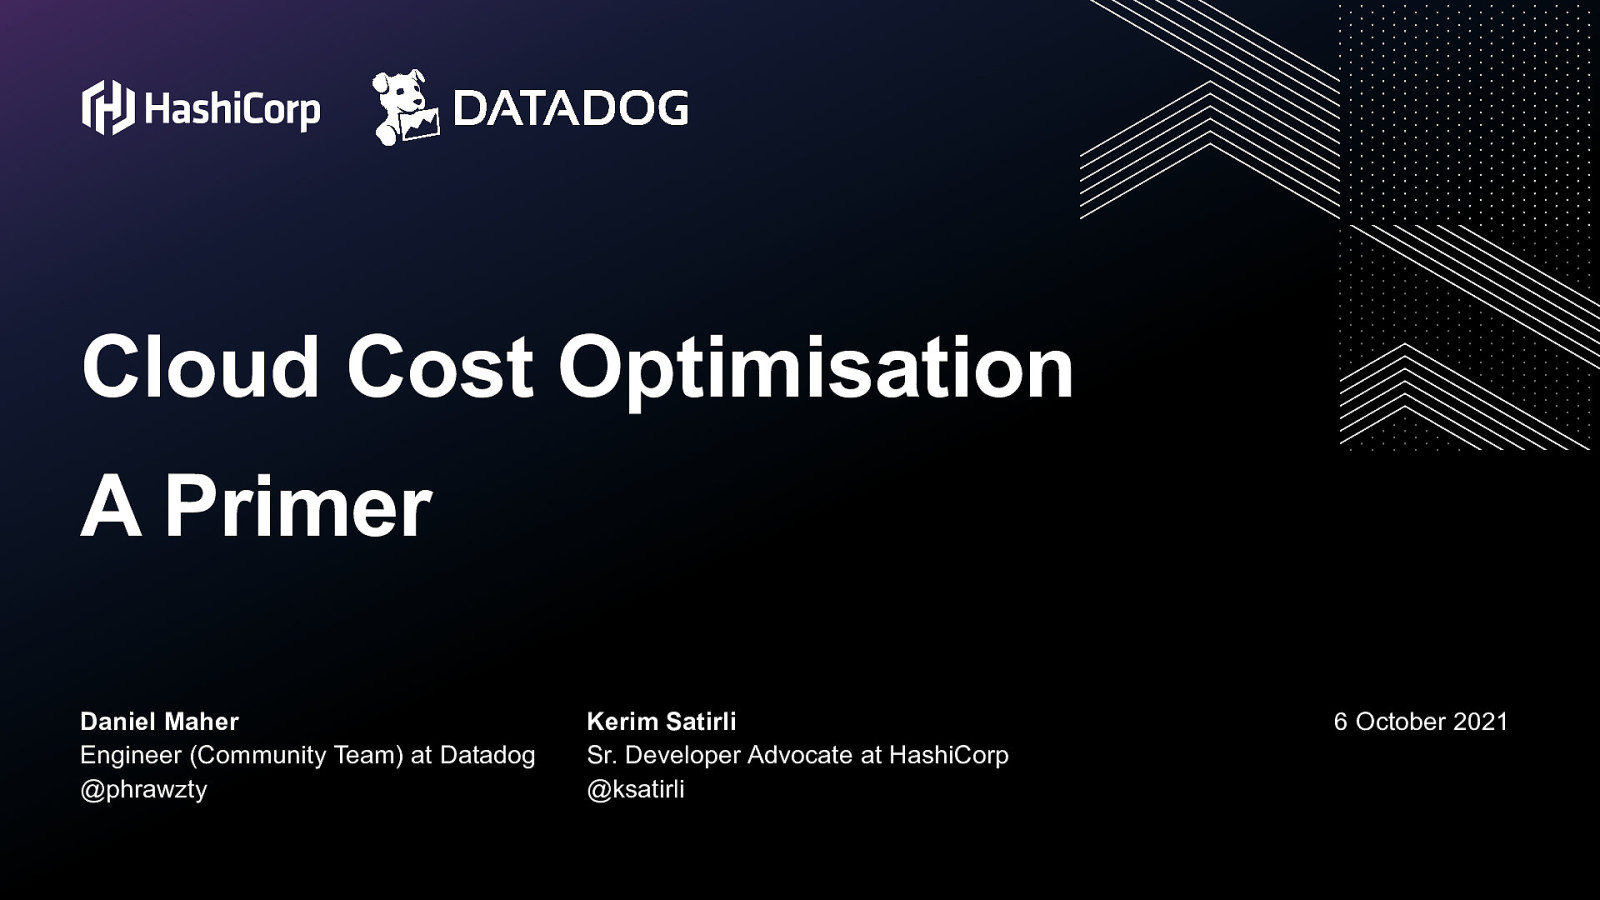 Cloud Cost Optimisation: A Primer